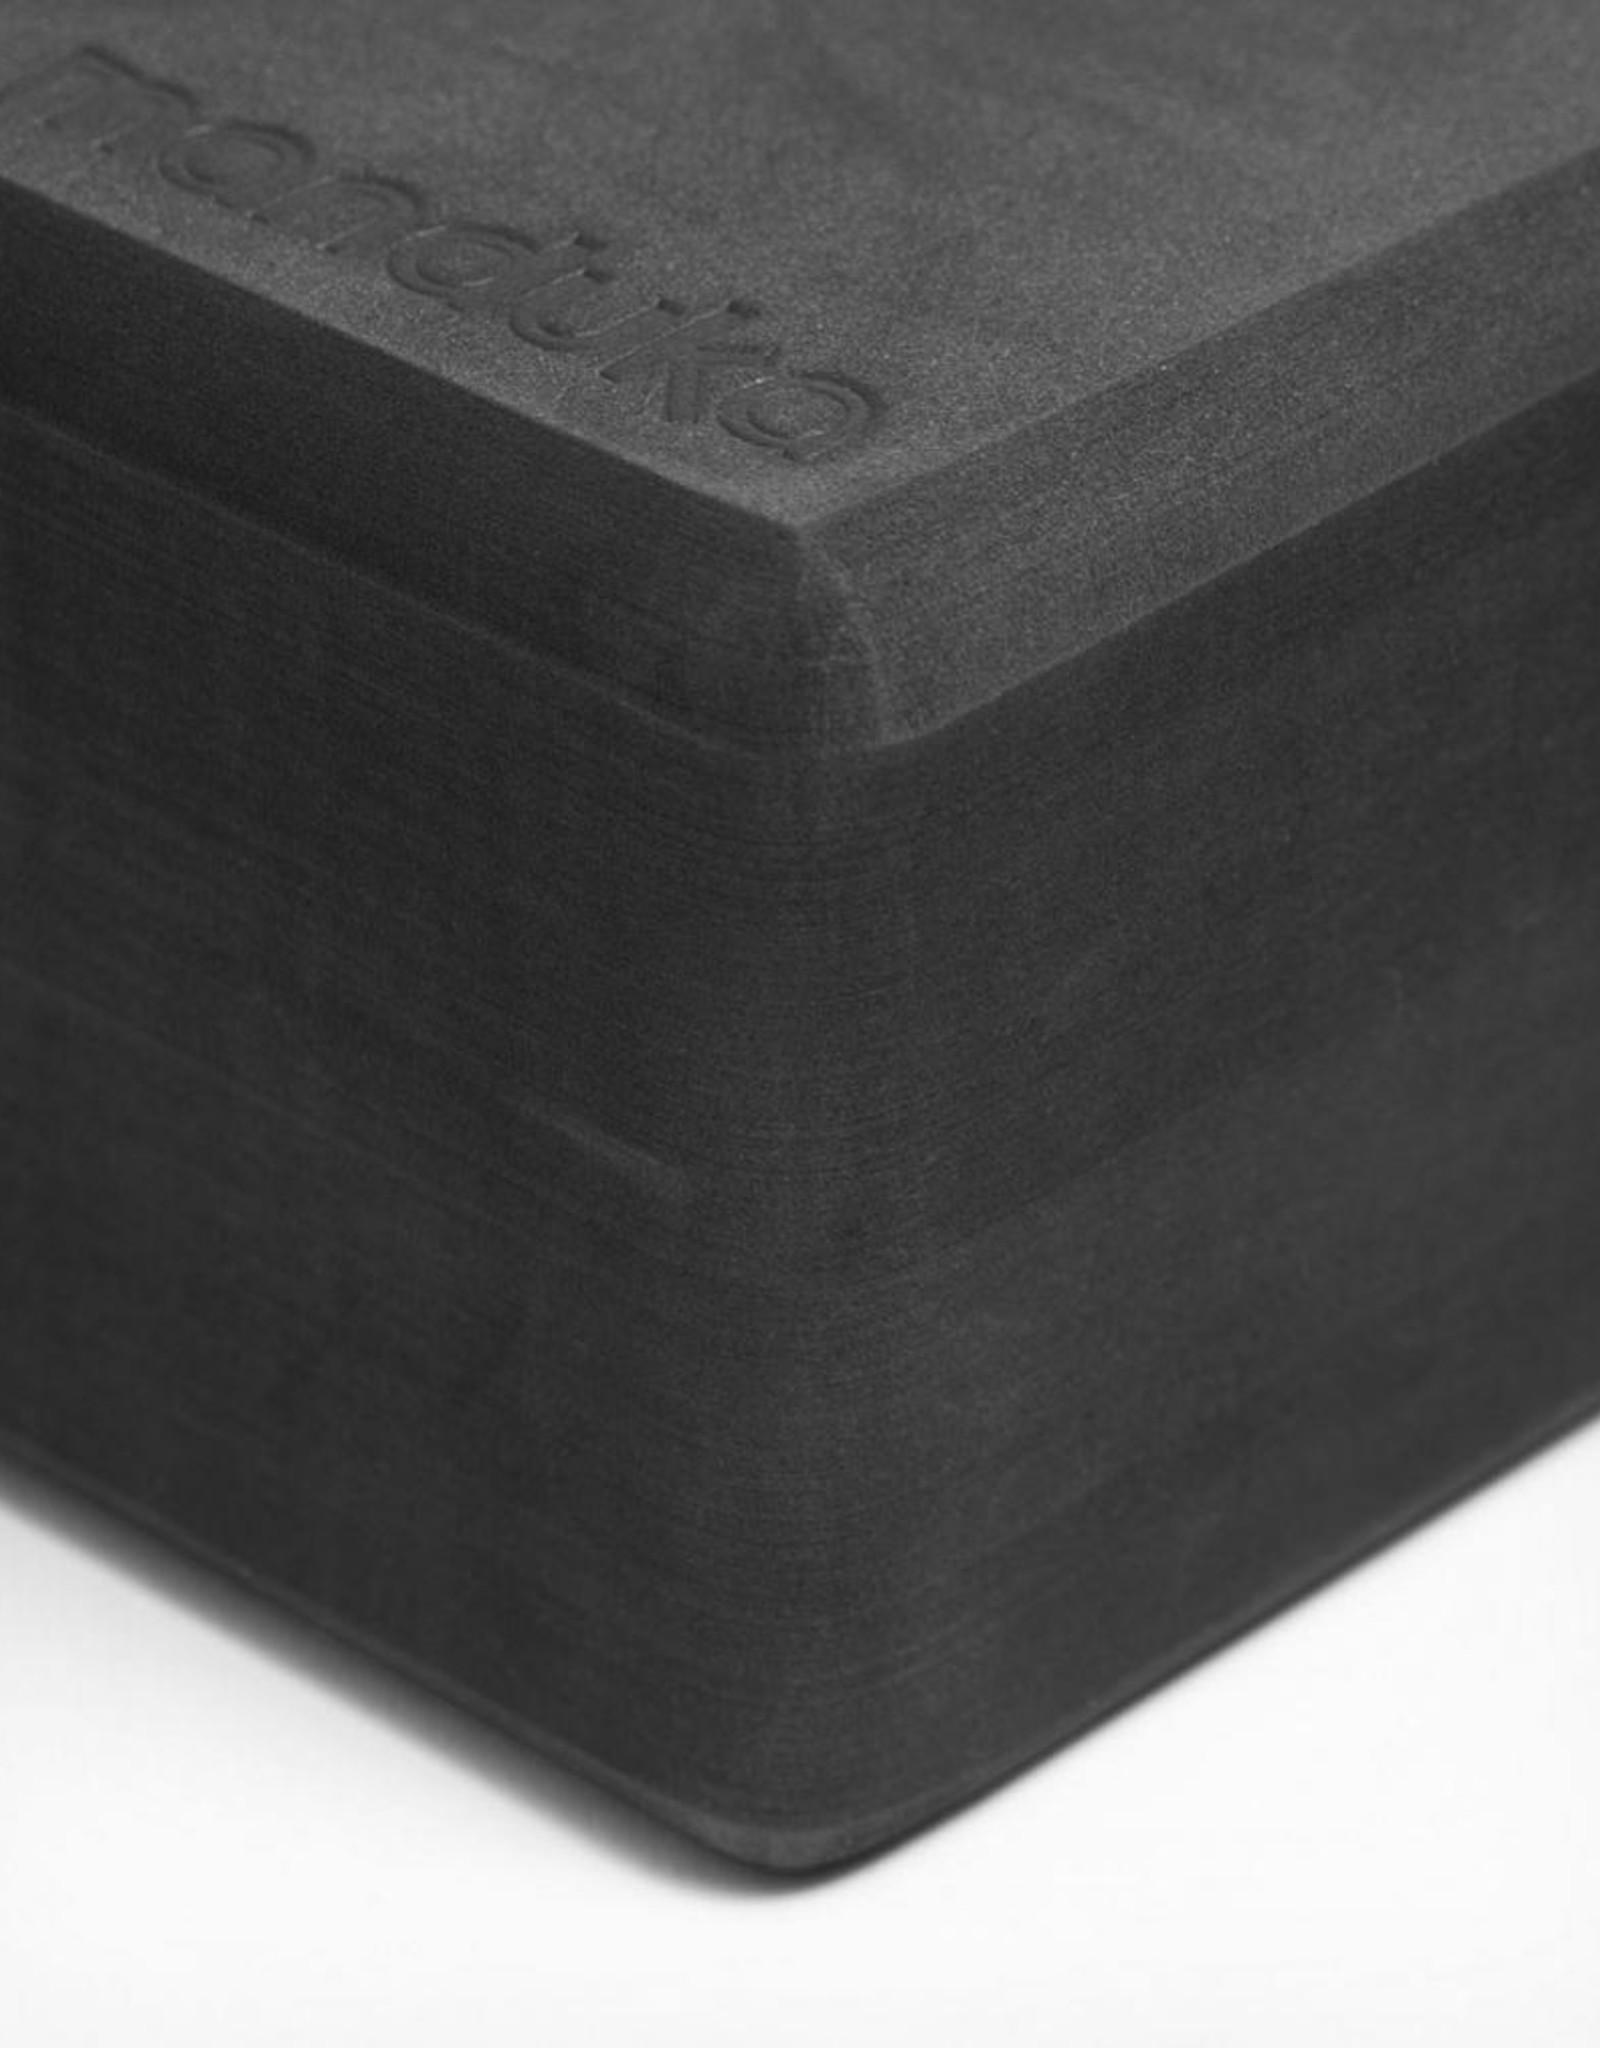 Manduka New Recycled Foam Yoga Block - Thunder